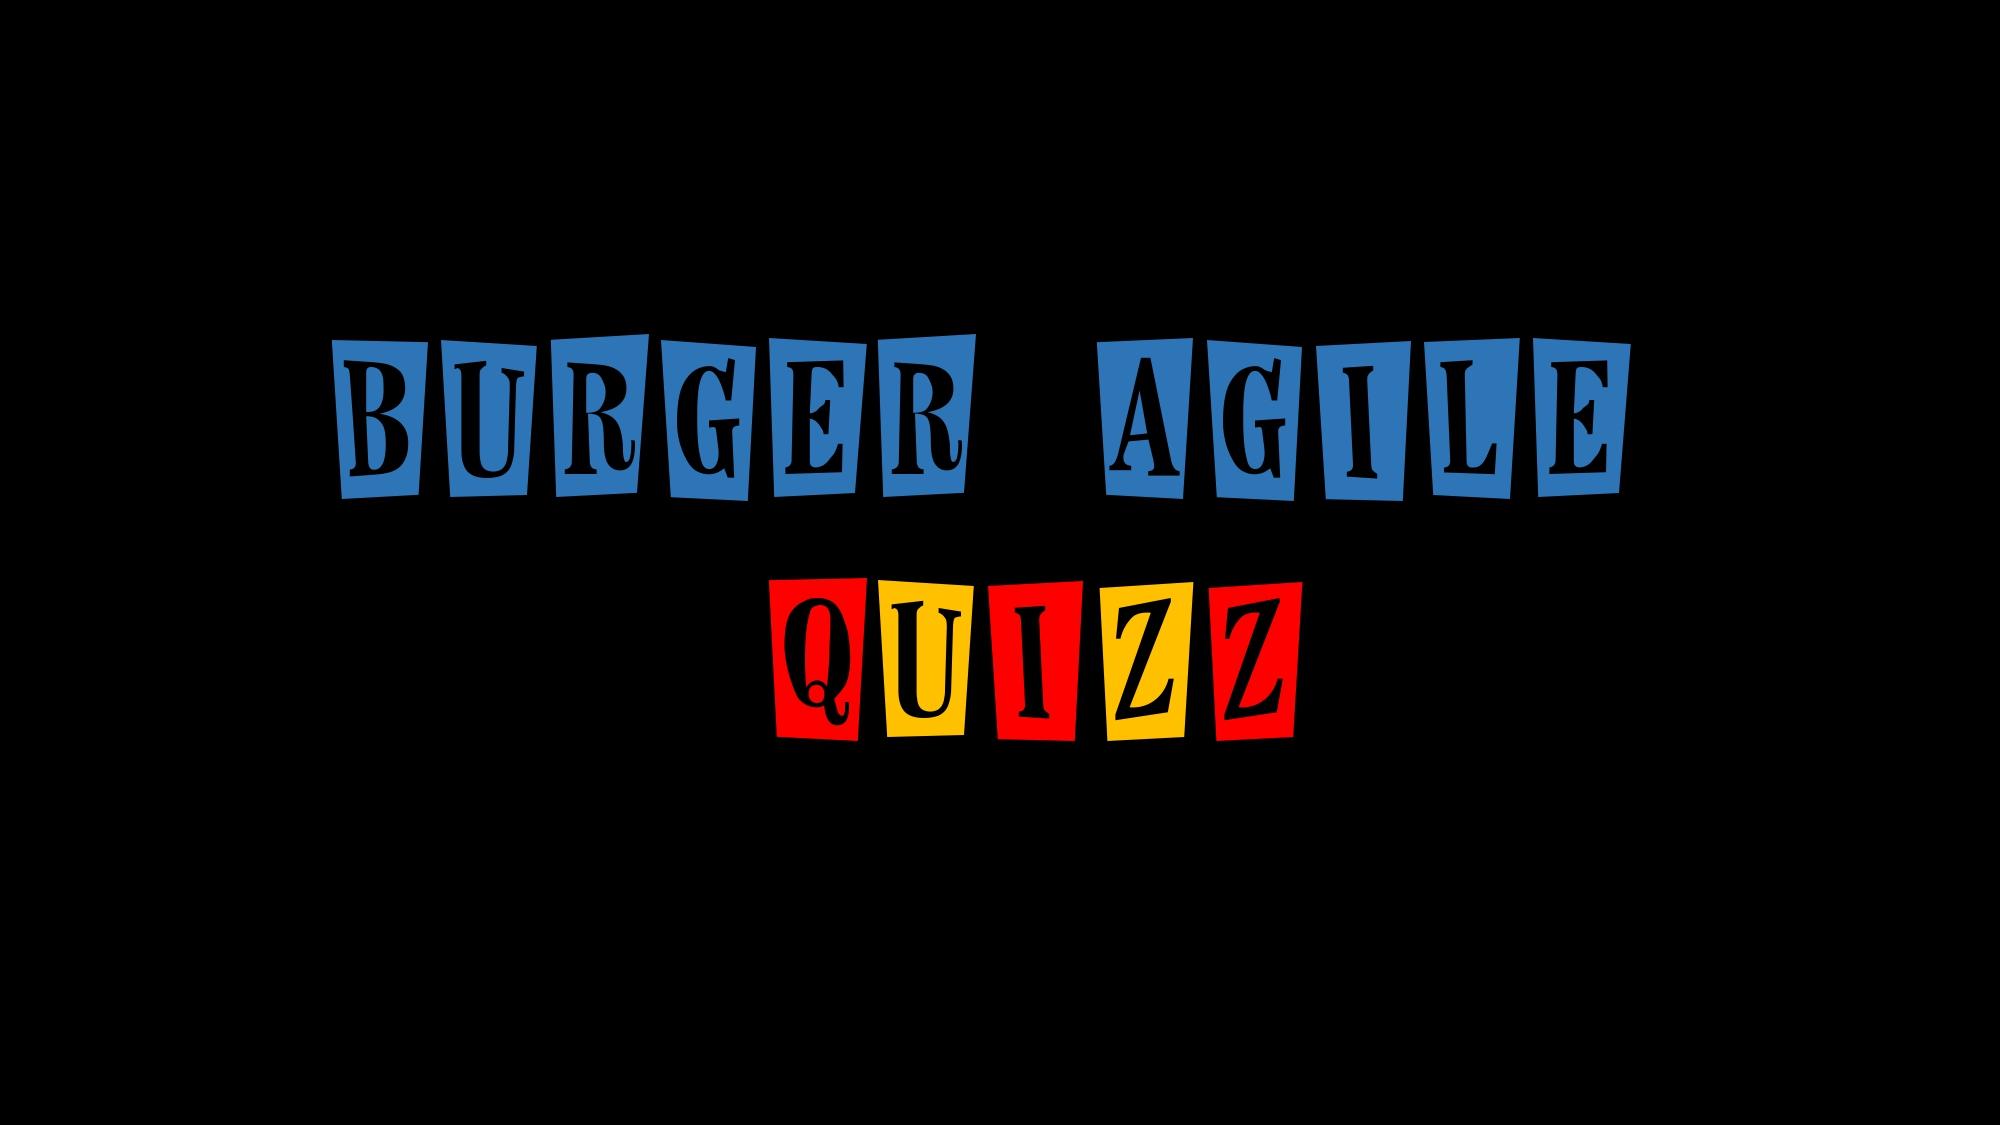 Burger Agile Quiz v2